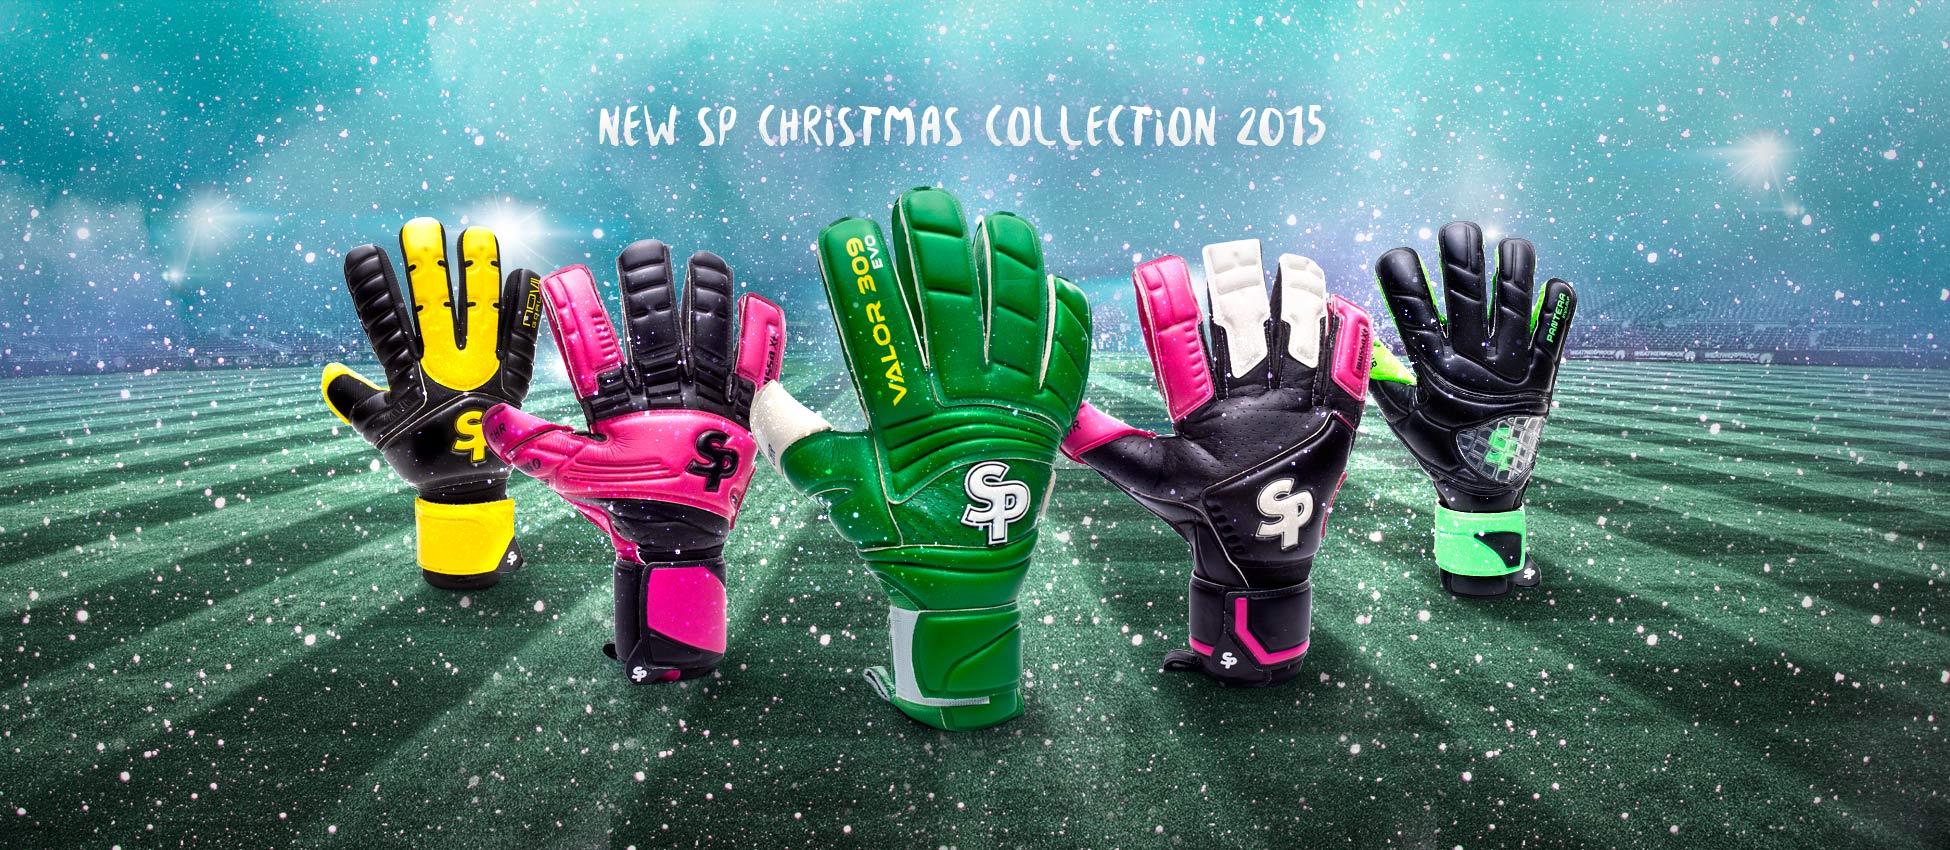 Gloves Soloporteros CHR 2015 EN